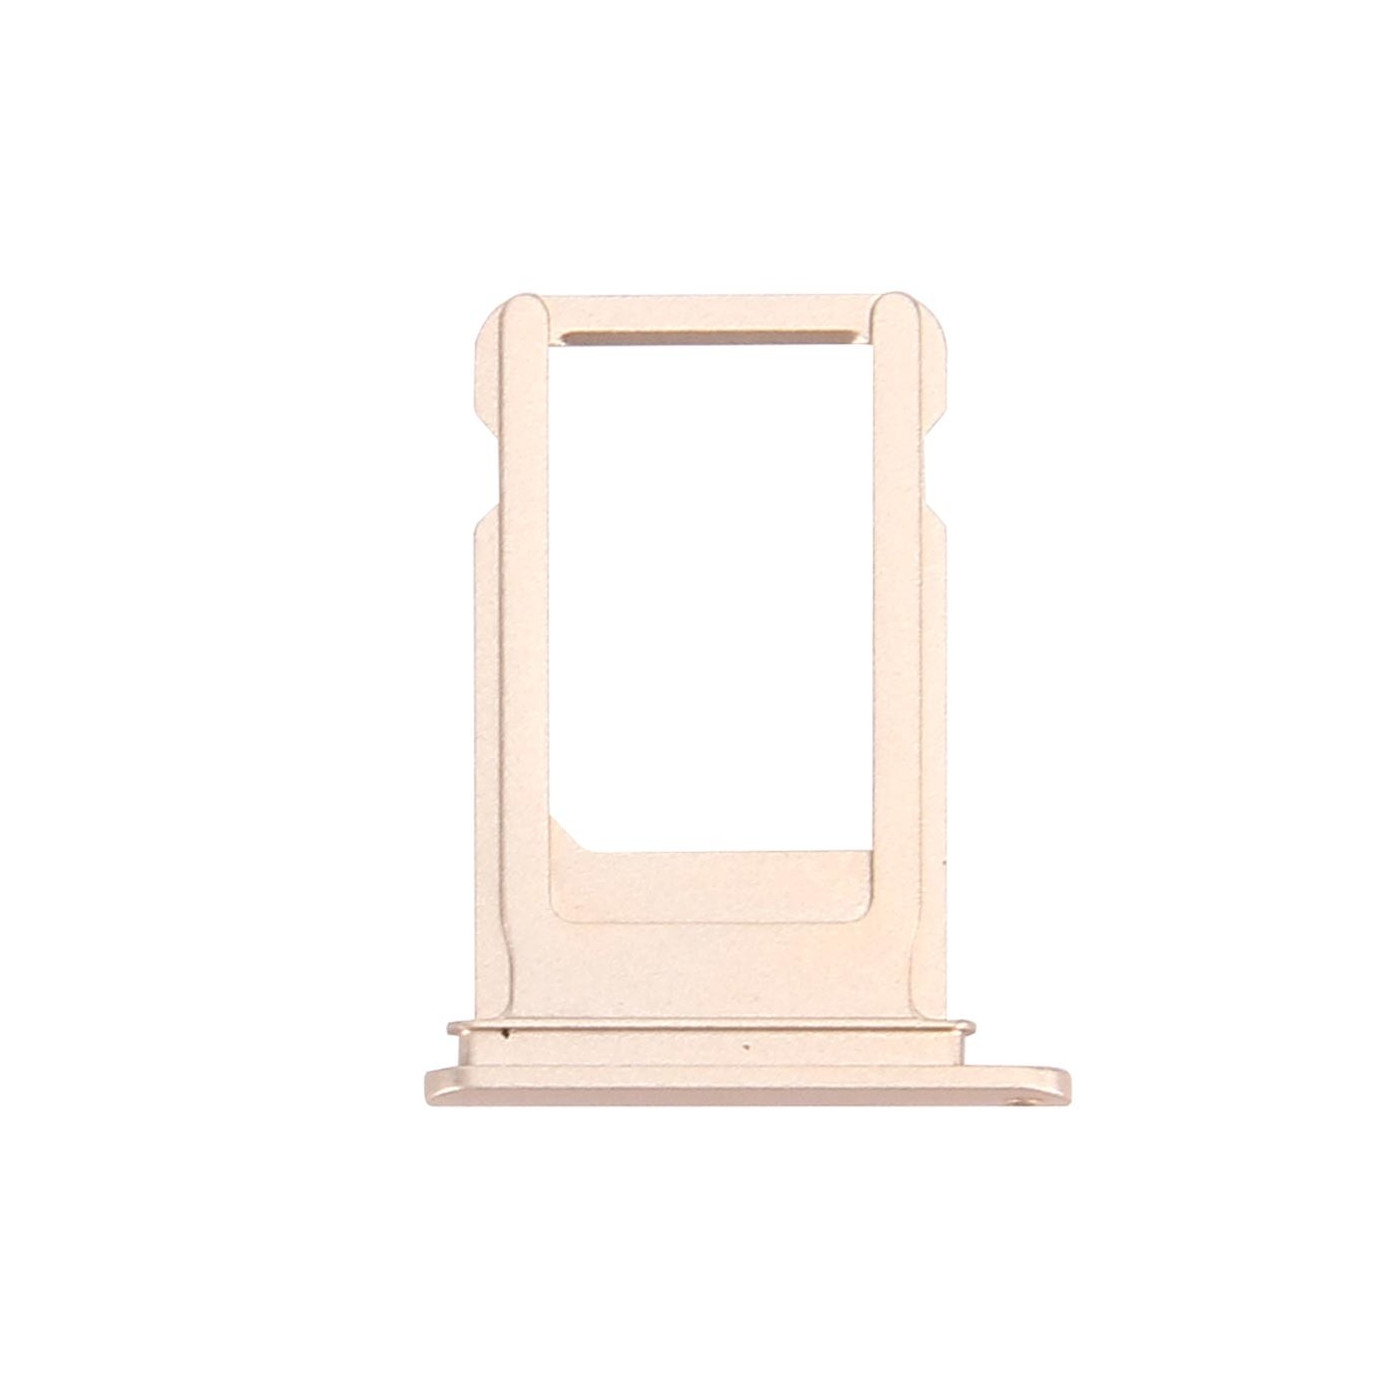 TITULAR DE LA TARJETA SIM Apple iPhone 7 Gold REEMPLAZO DE LA BANDEJA DEL CARRO DE DESLIZAMIENTO SLOT